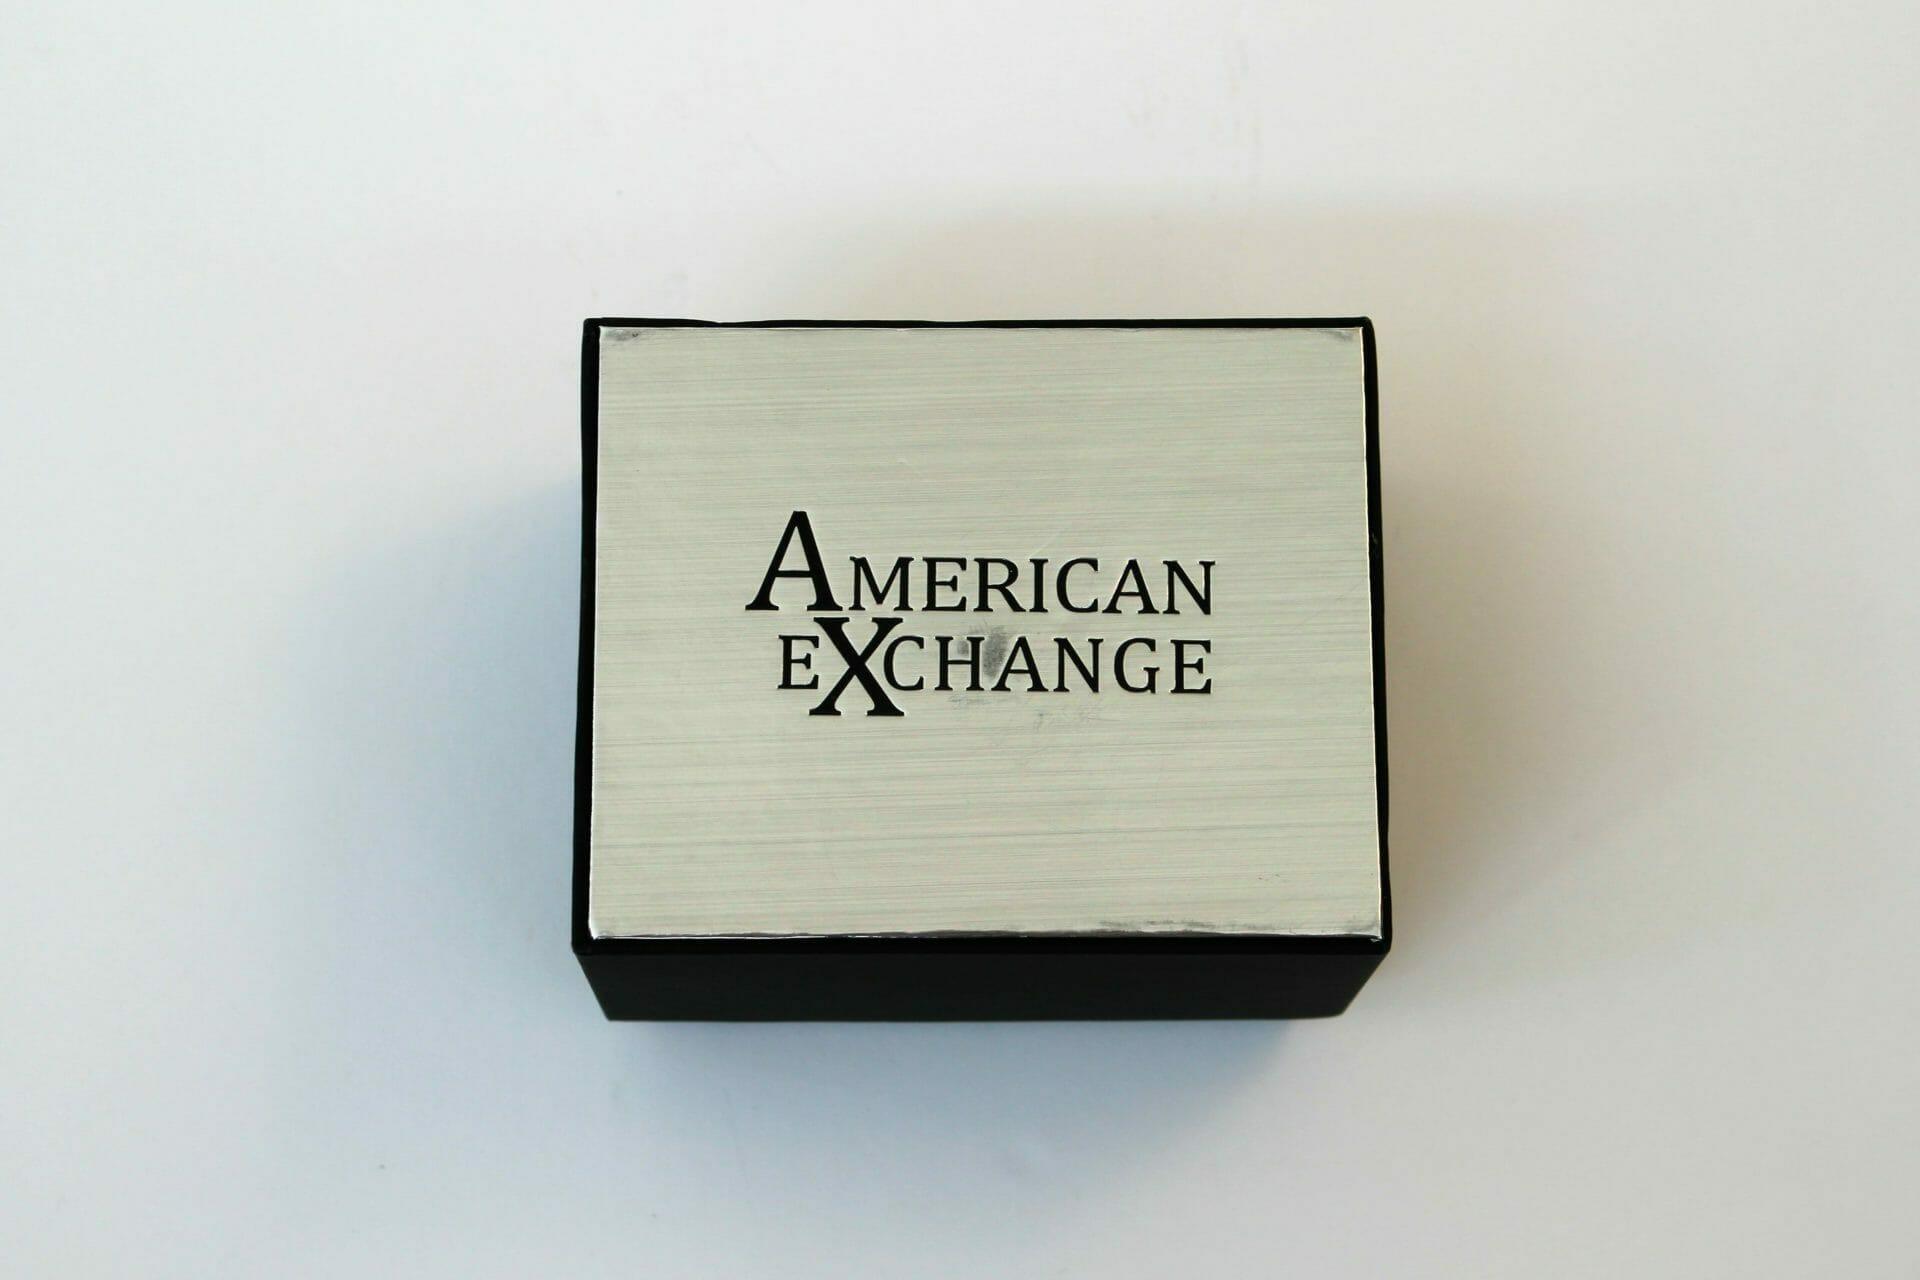 american exchange watch erushmo com your online store gunmetal chronograph 3 piece watch set for men